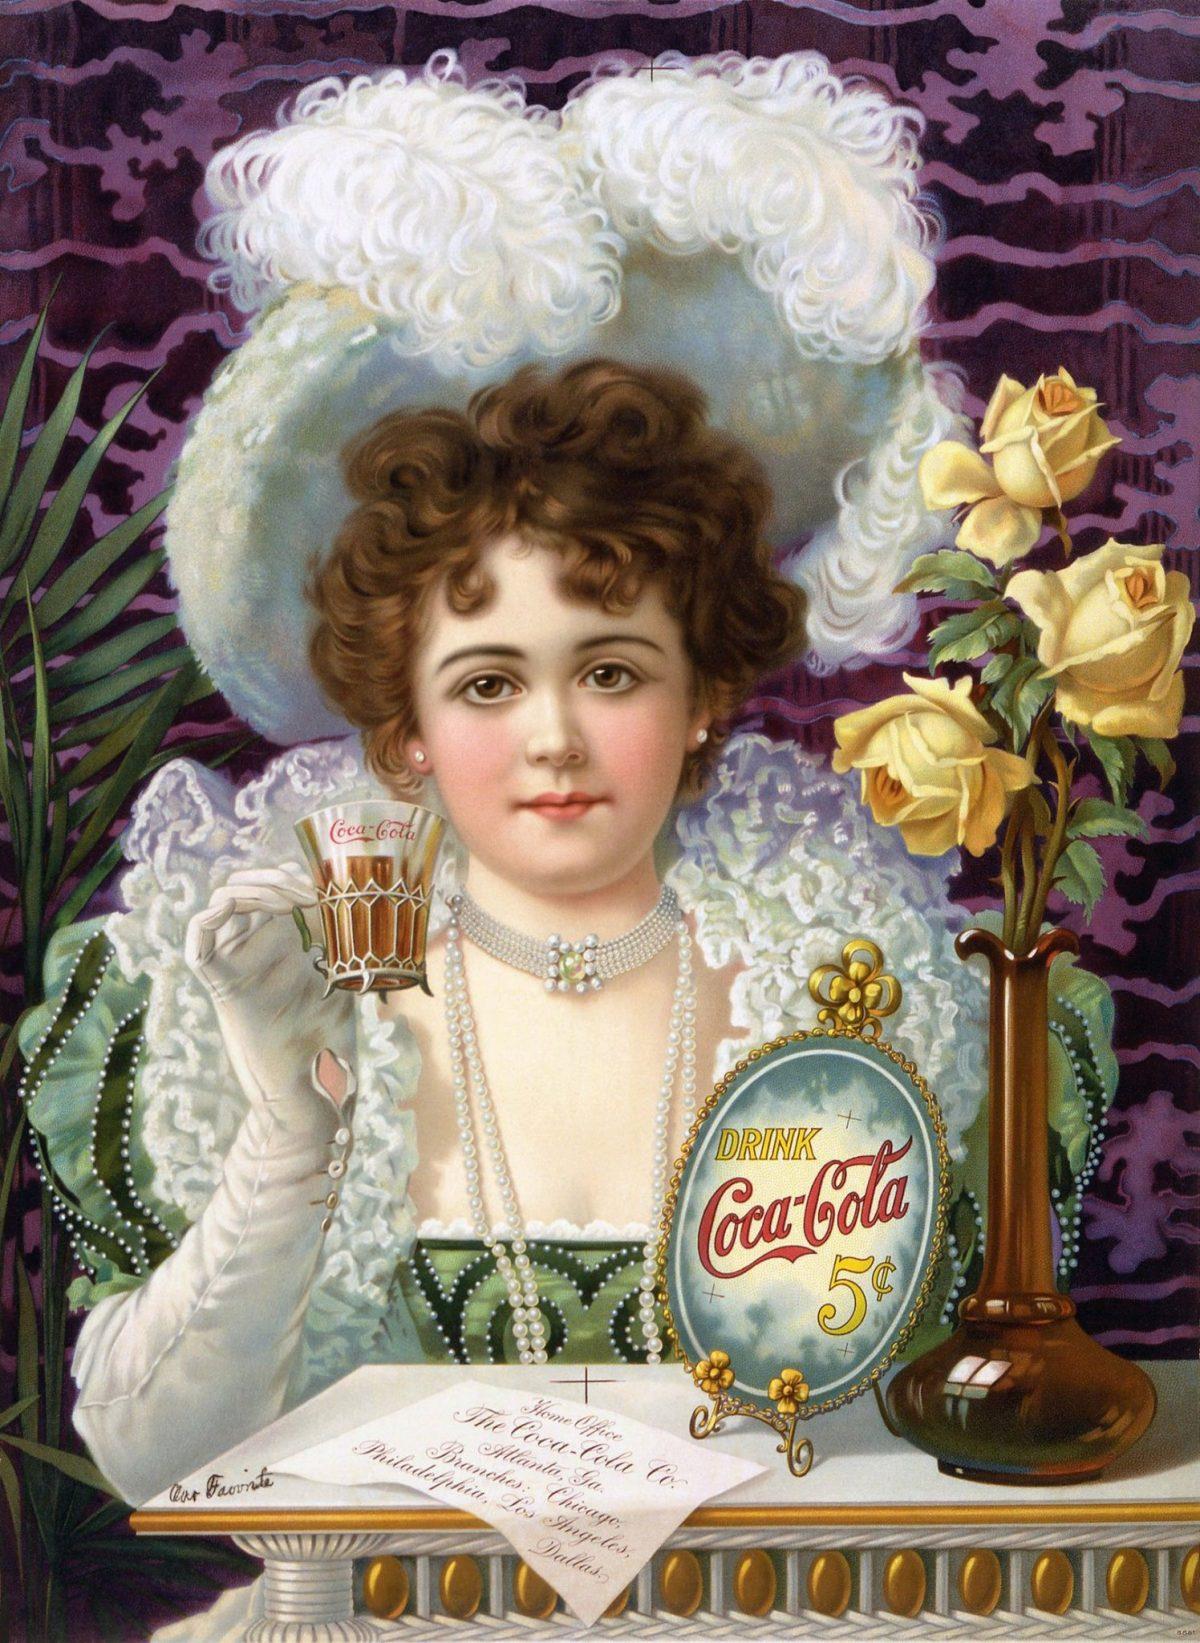 Coca-Cola ad with Hilda Clark, 1890s